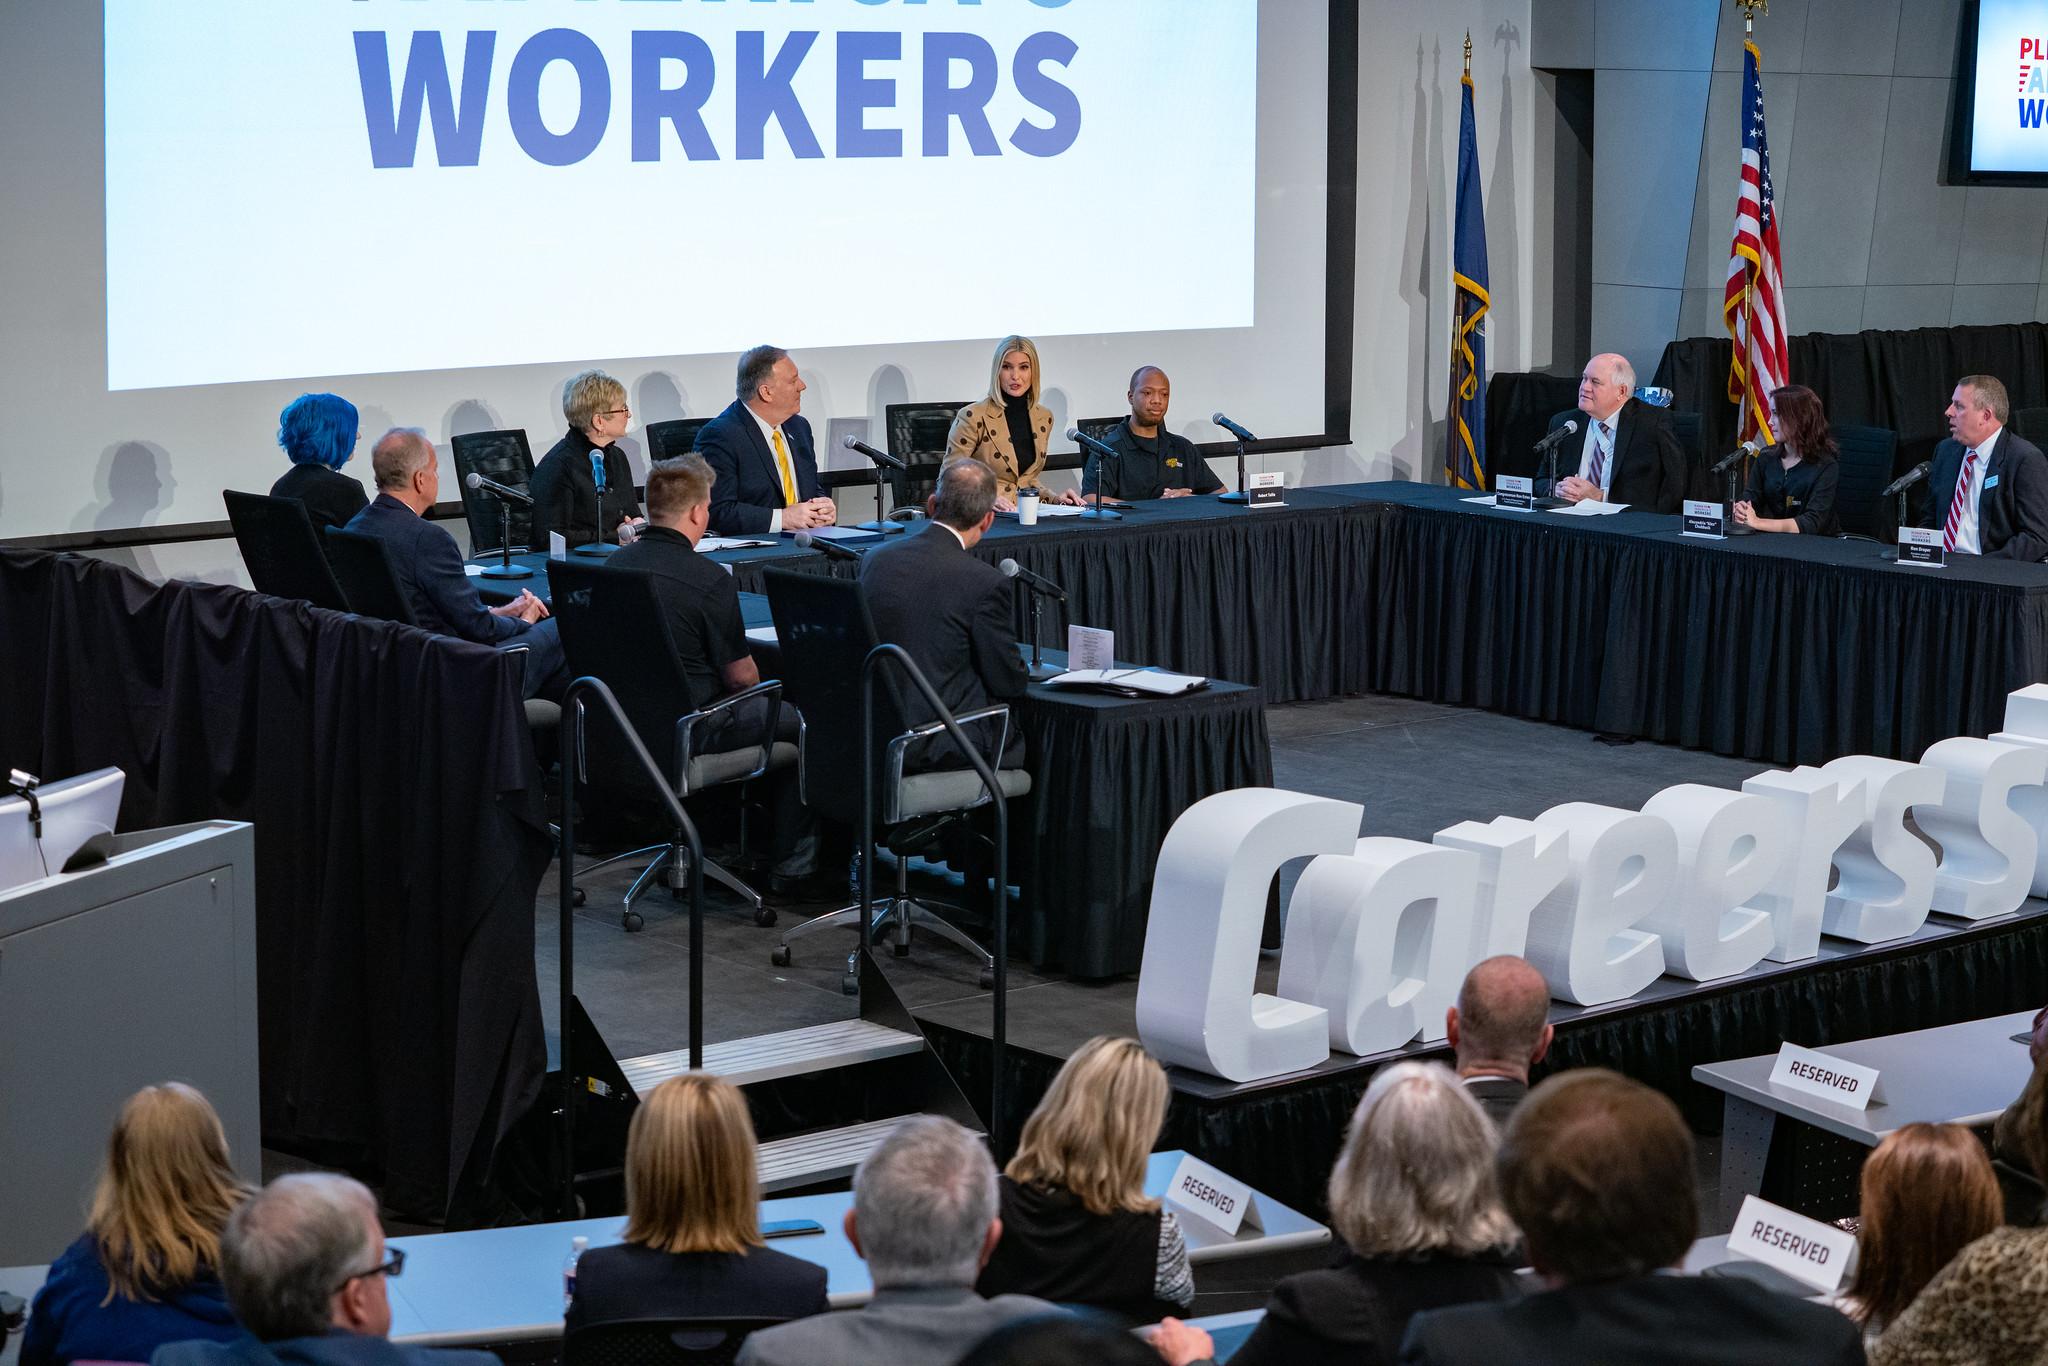 Secretary Pompeo and Senior Advisor to the President Ivanka Trump Participate in a Workforce Development Roundtable